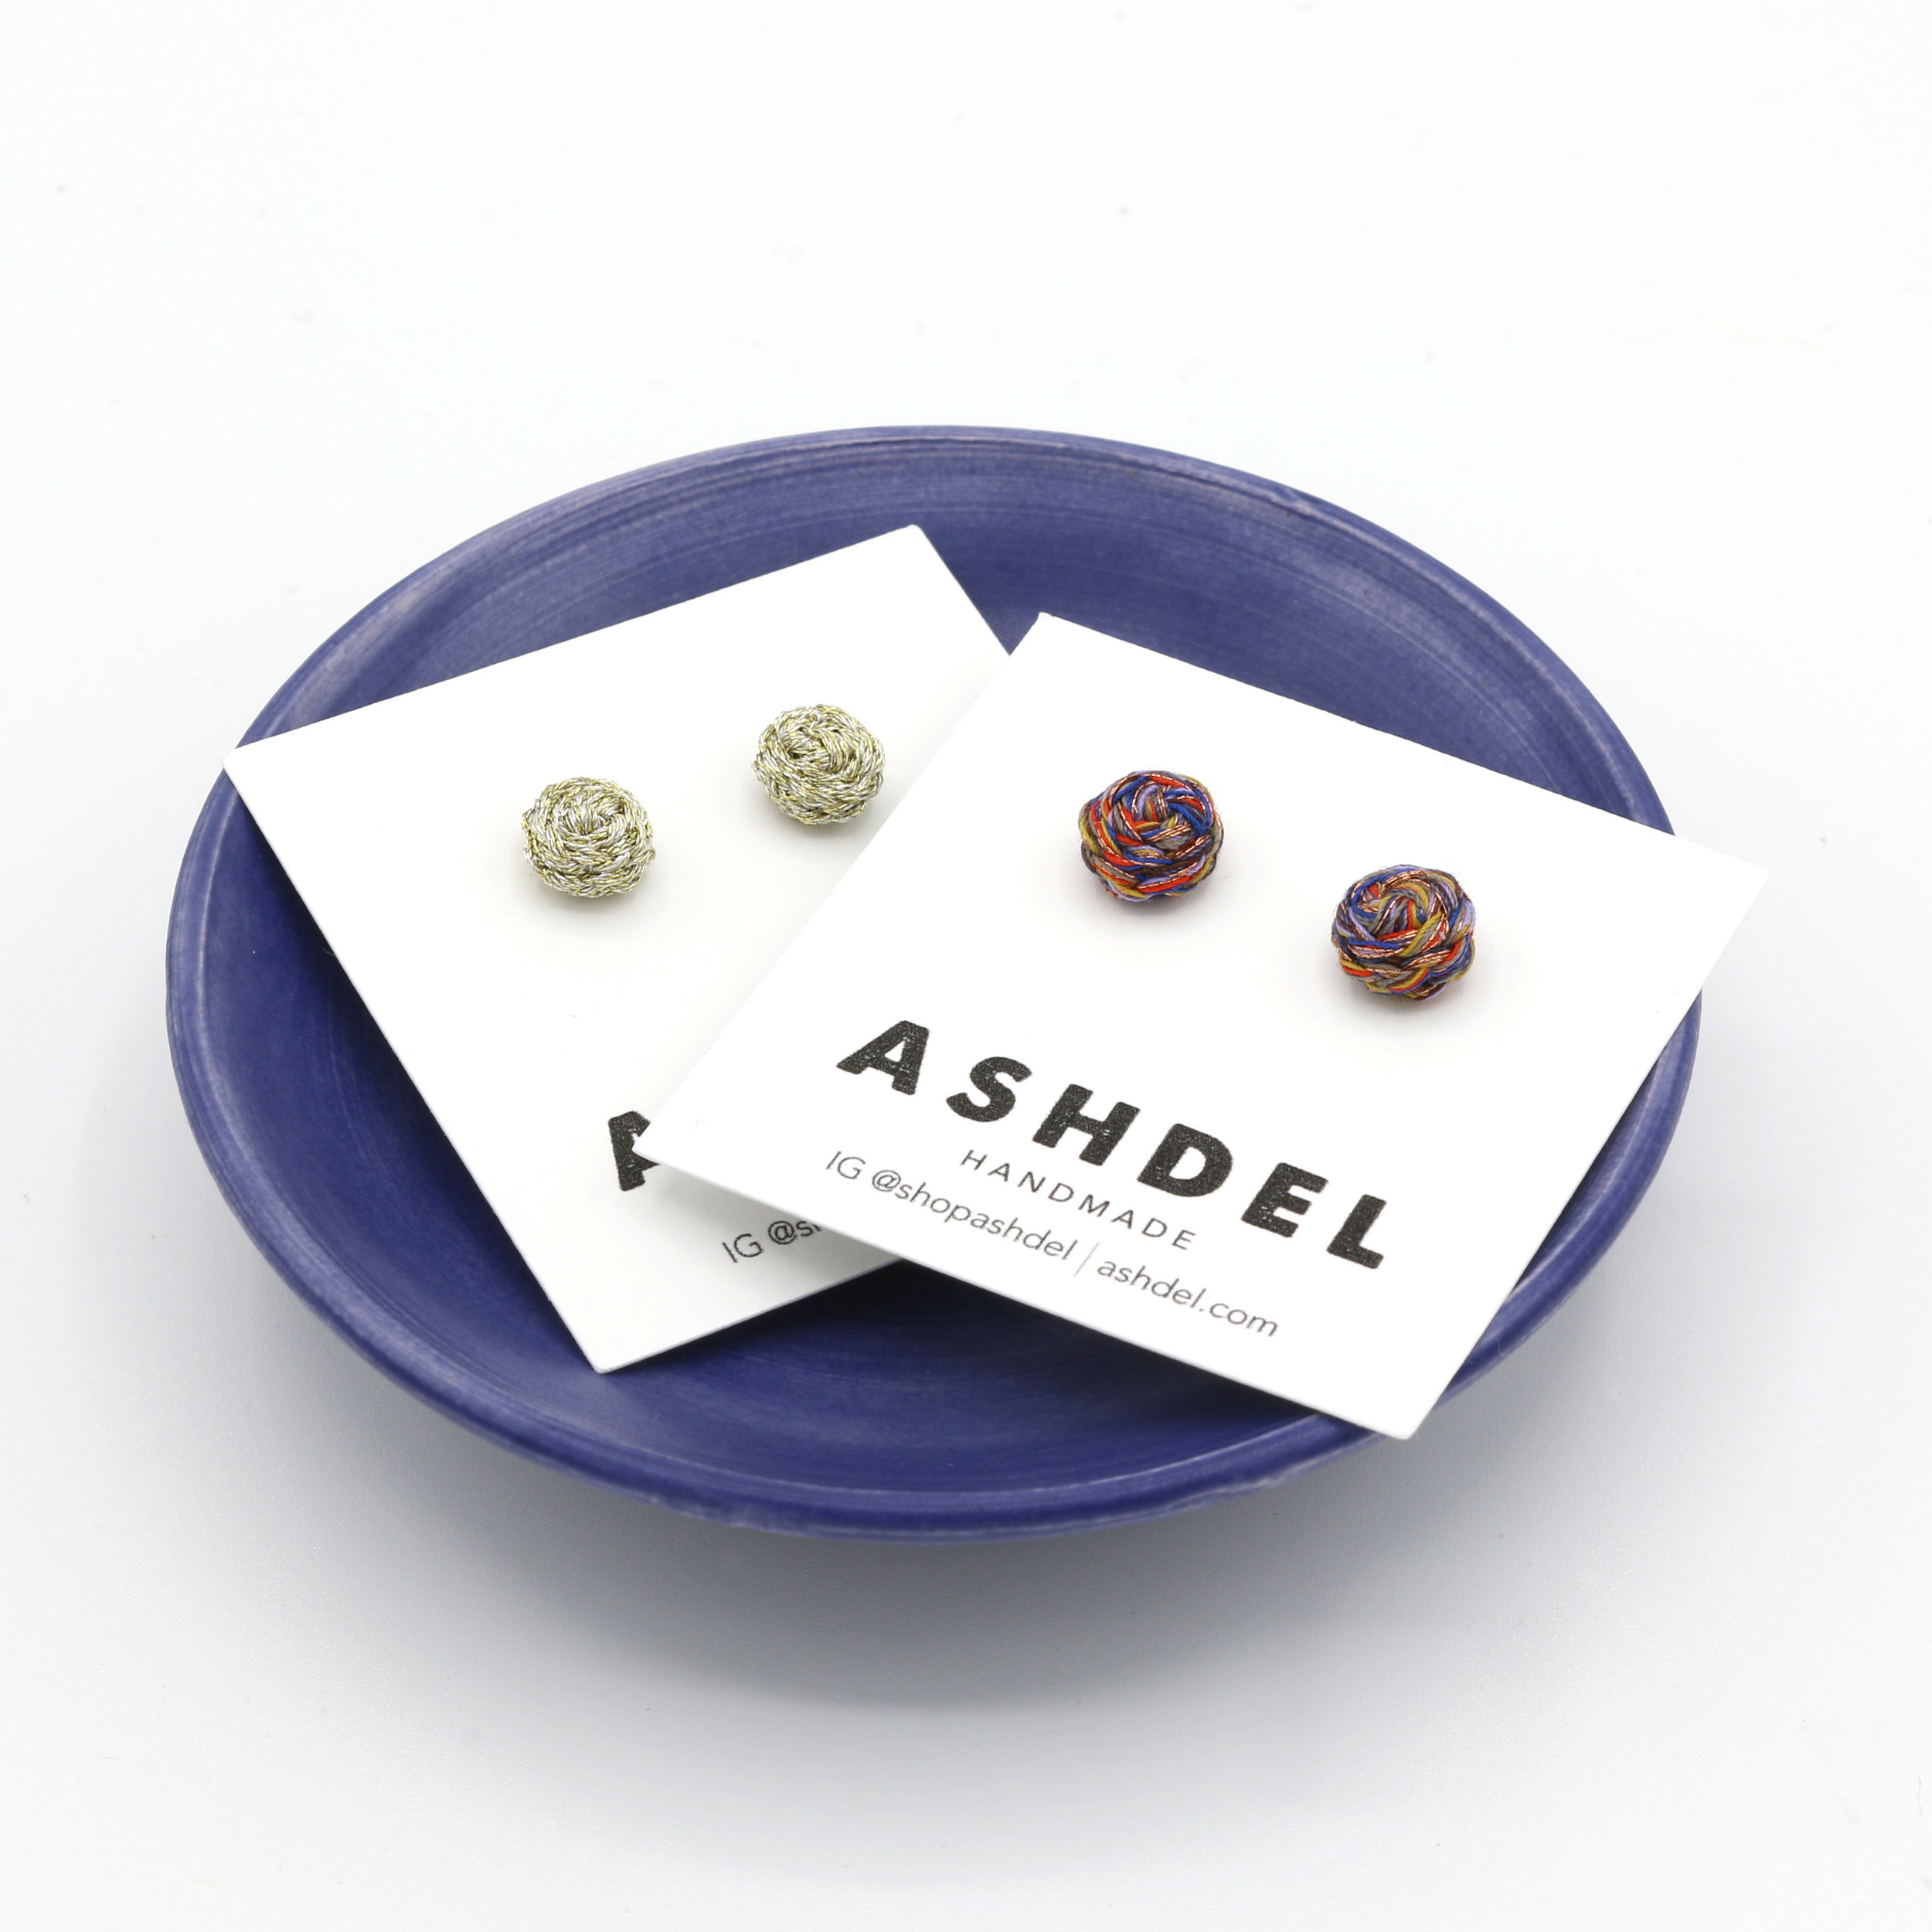 ashdel-hand-sewn-jewelry-2.jpg